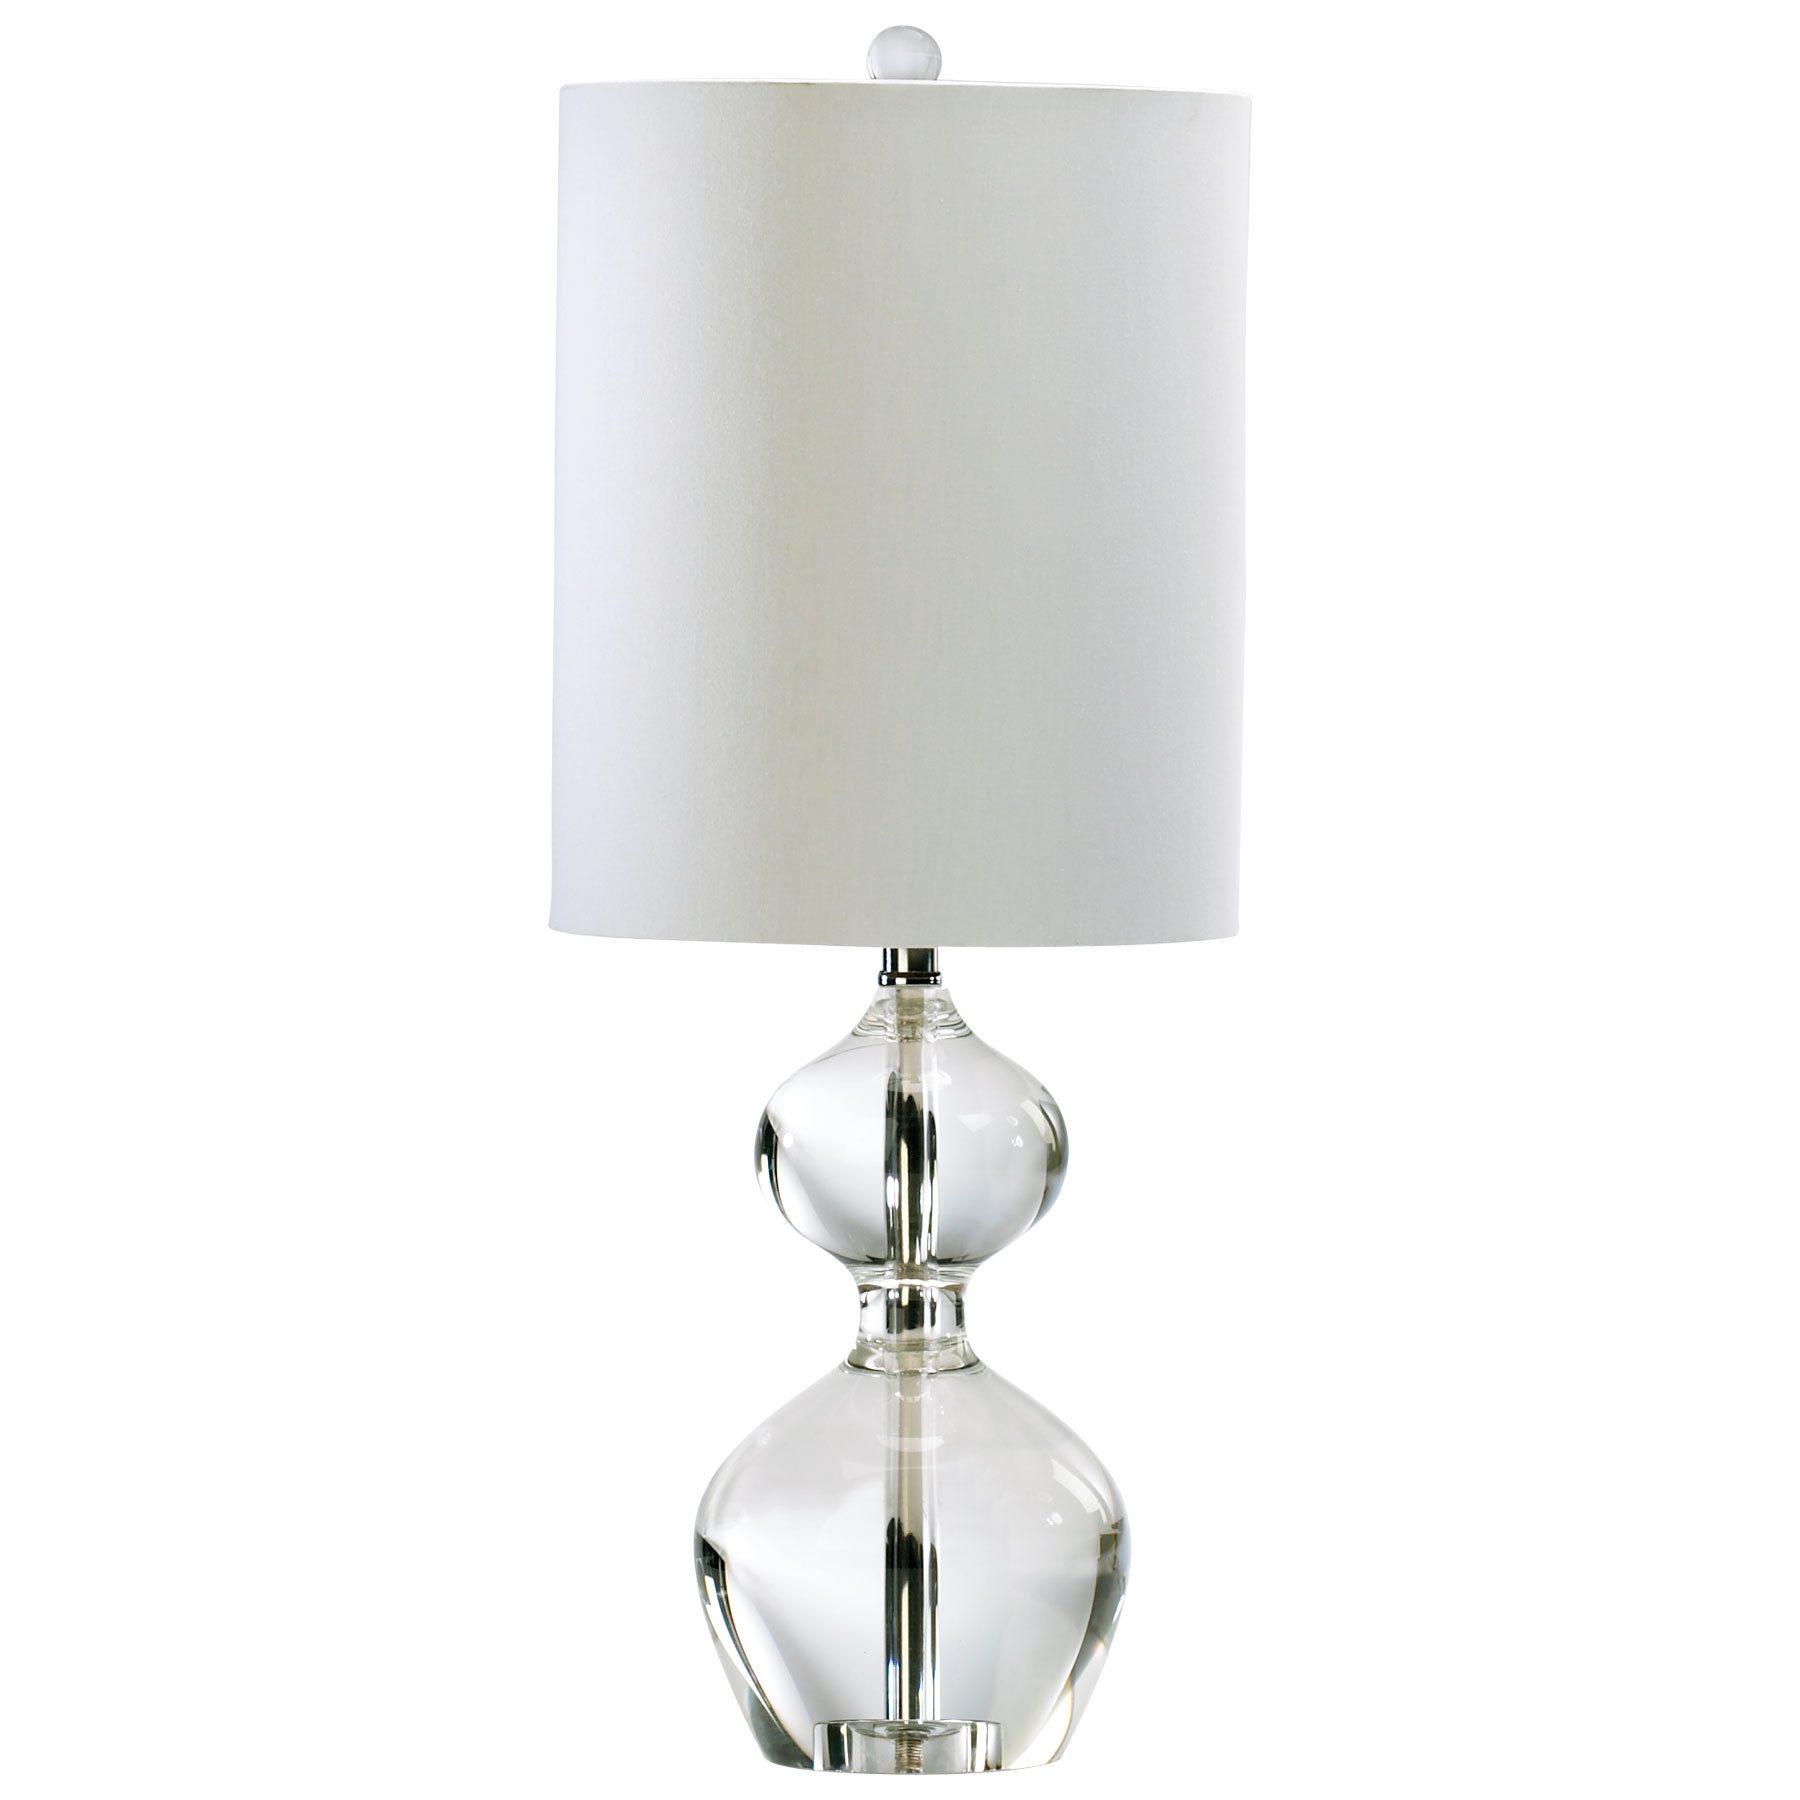 Sven Sydney Contemporary Table Lamp Xnc 88920